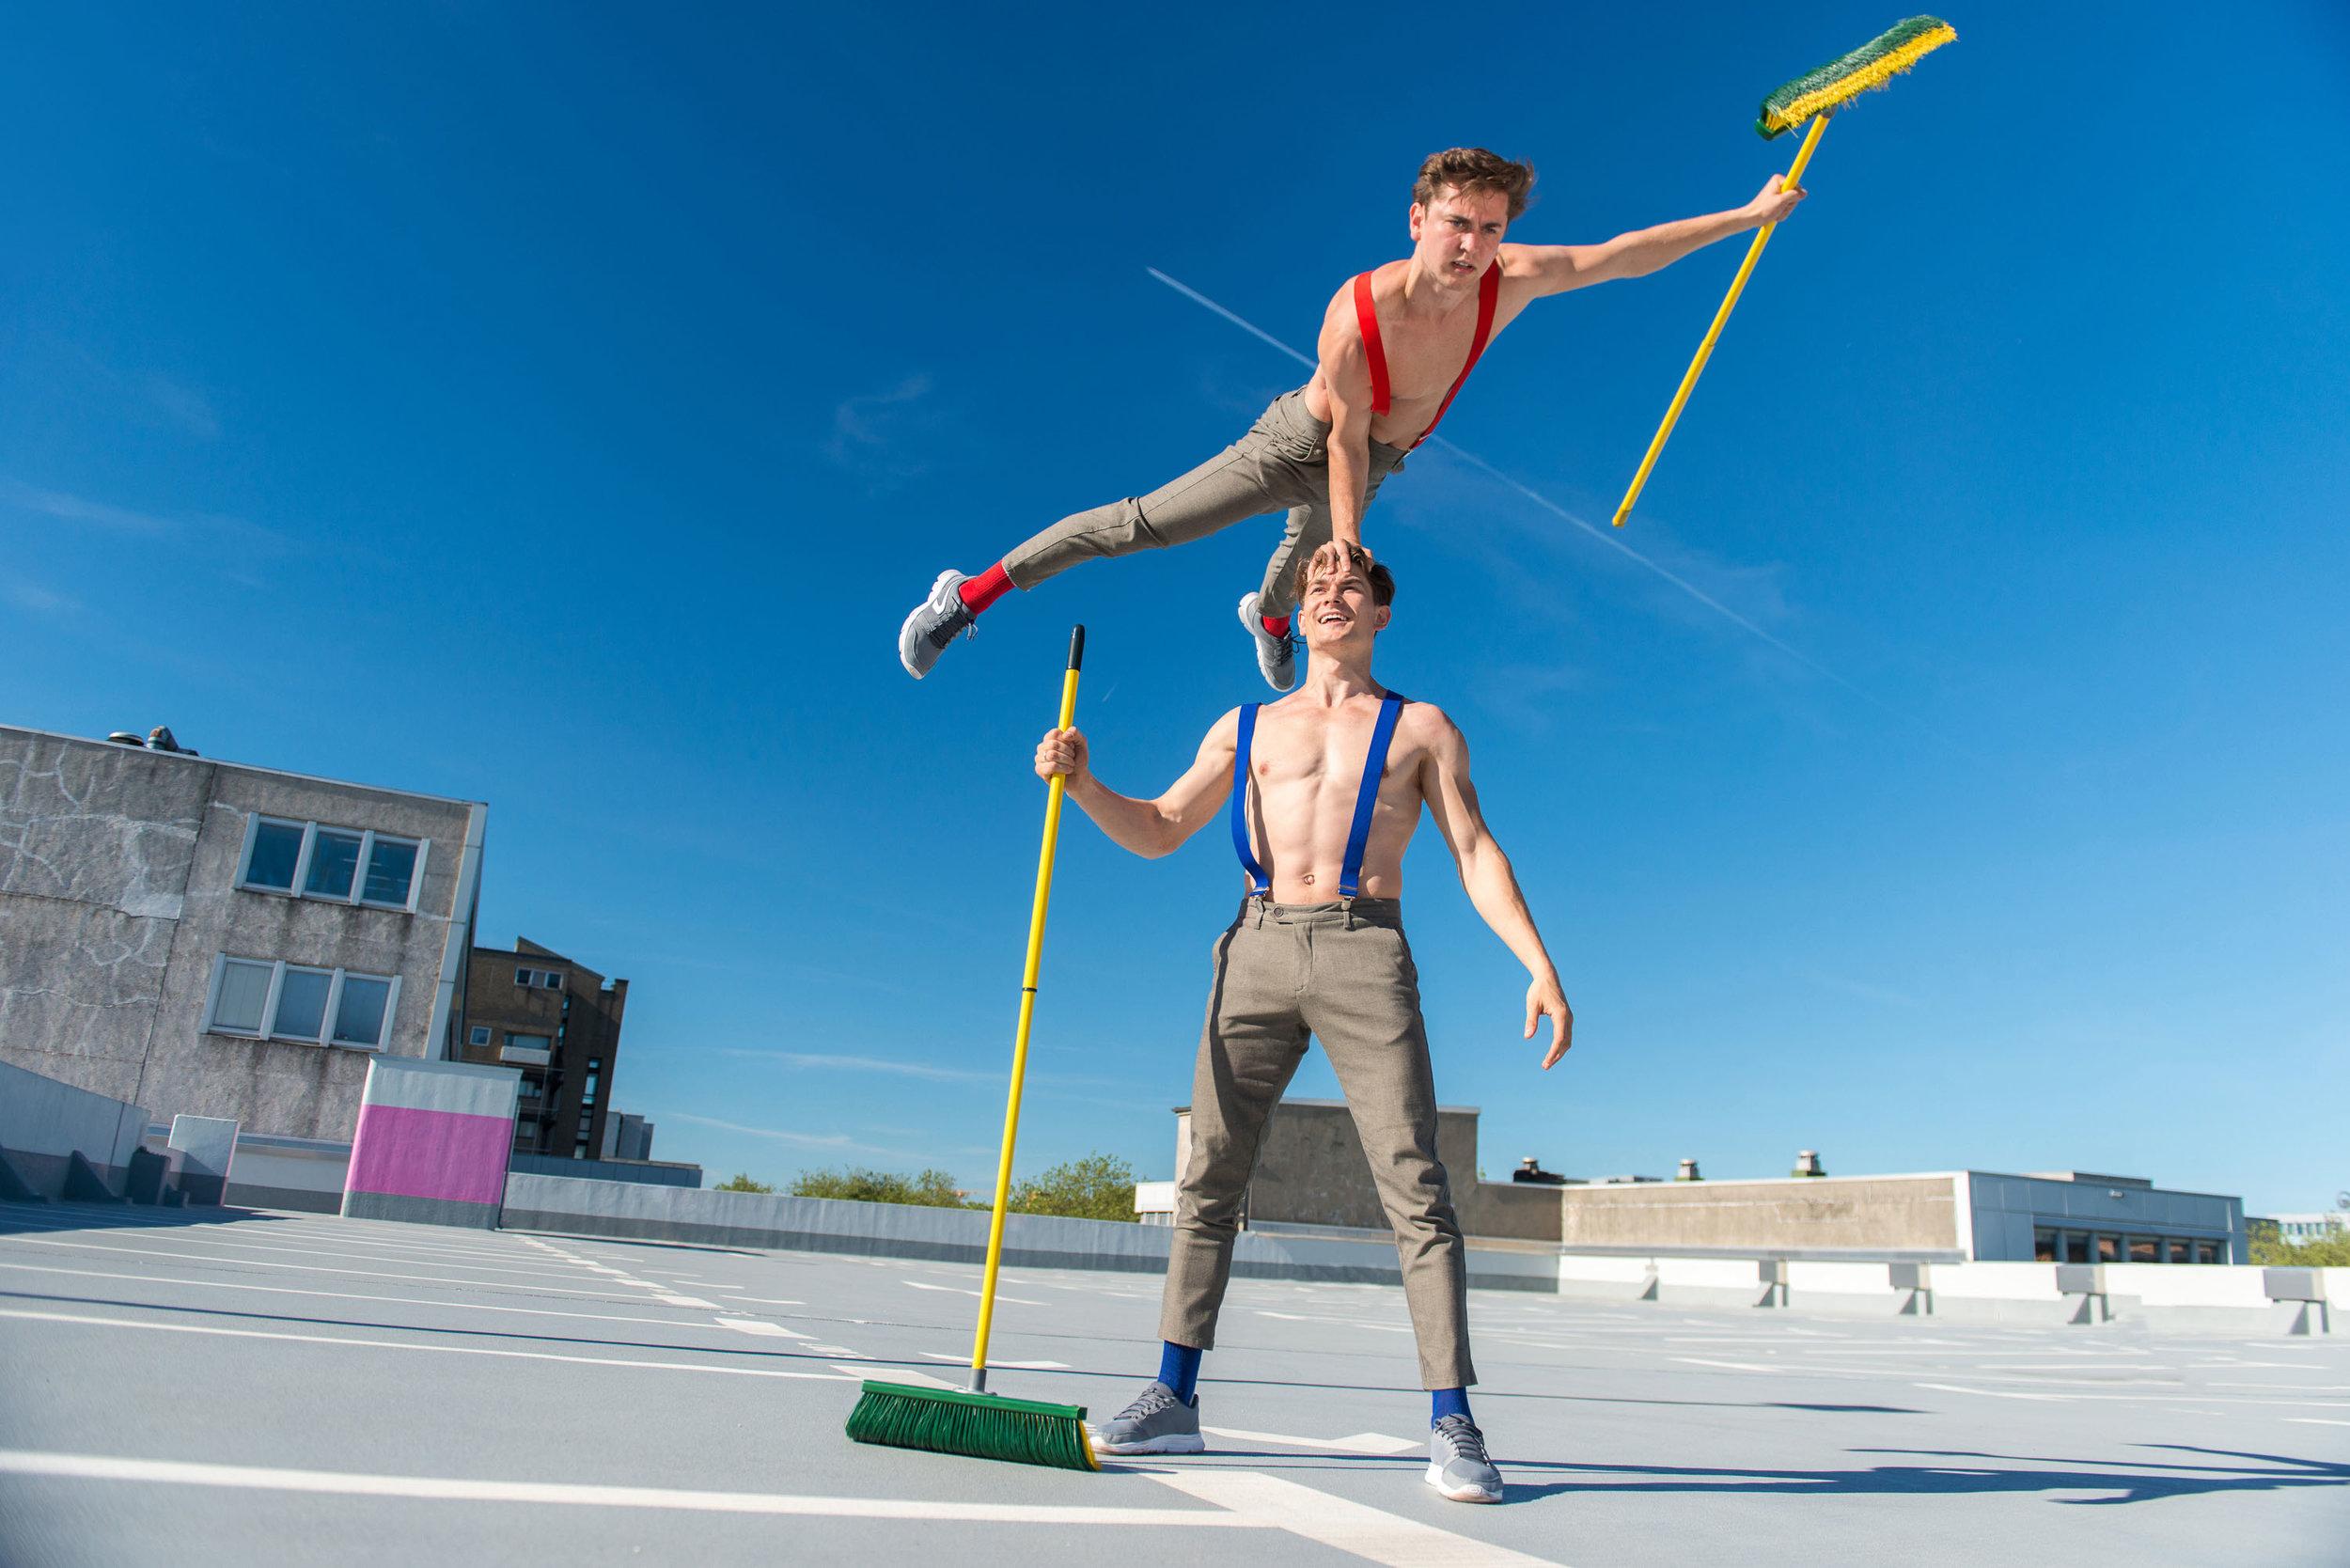 Dennys-Mamero-Photography-Sports-acrobatics-Jim-John-3.jpg